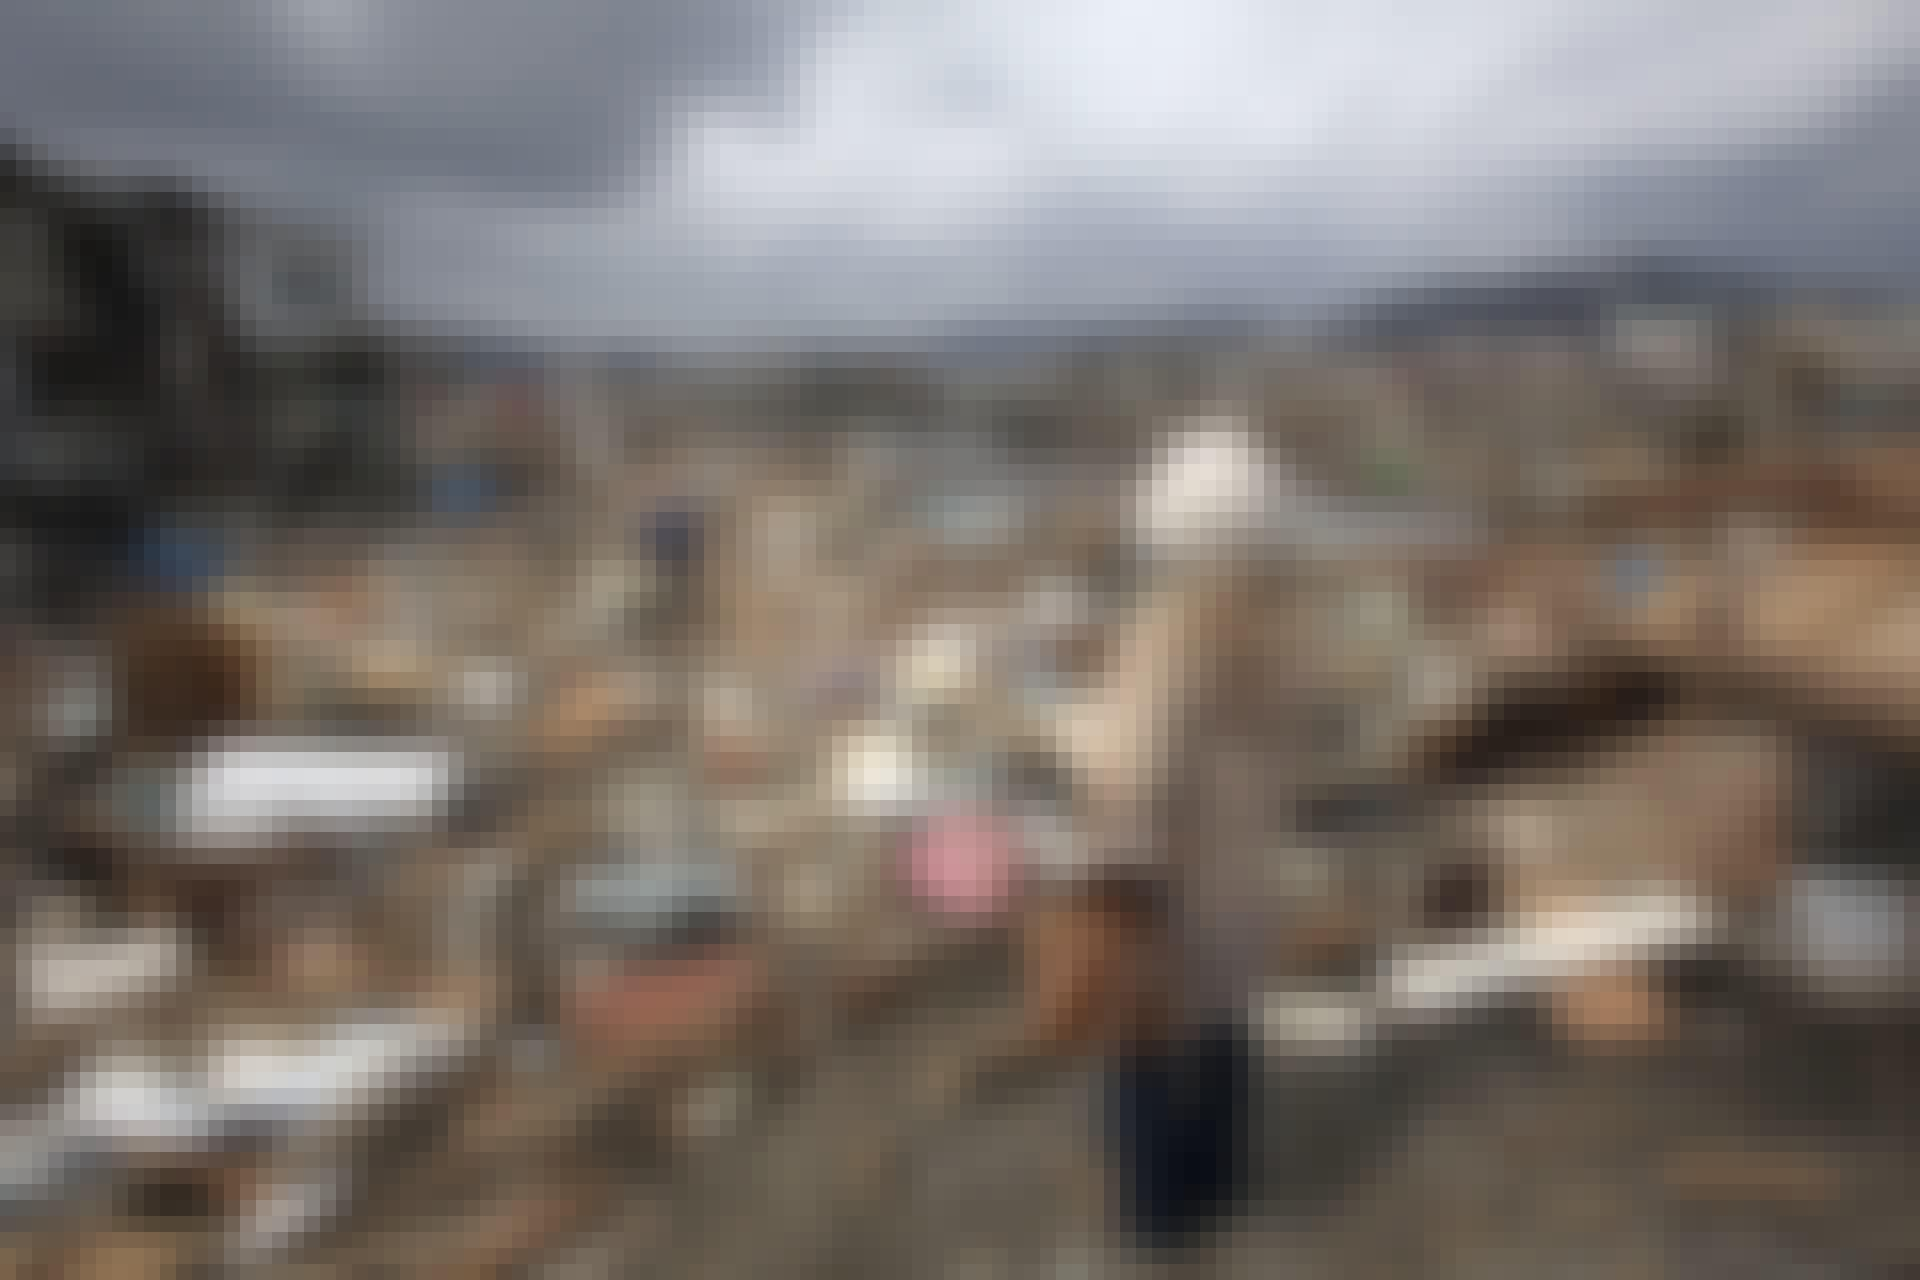 Jordskælv 17/2014